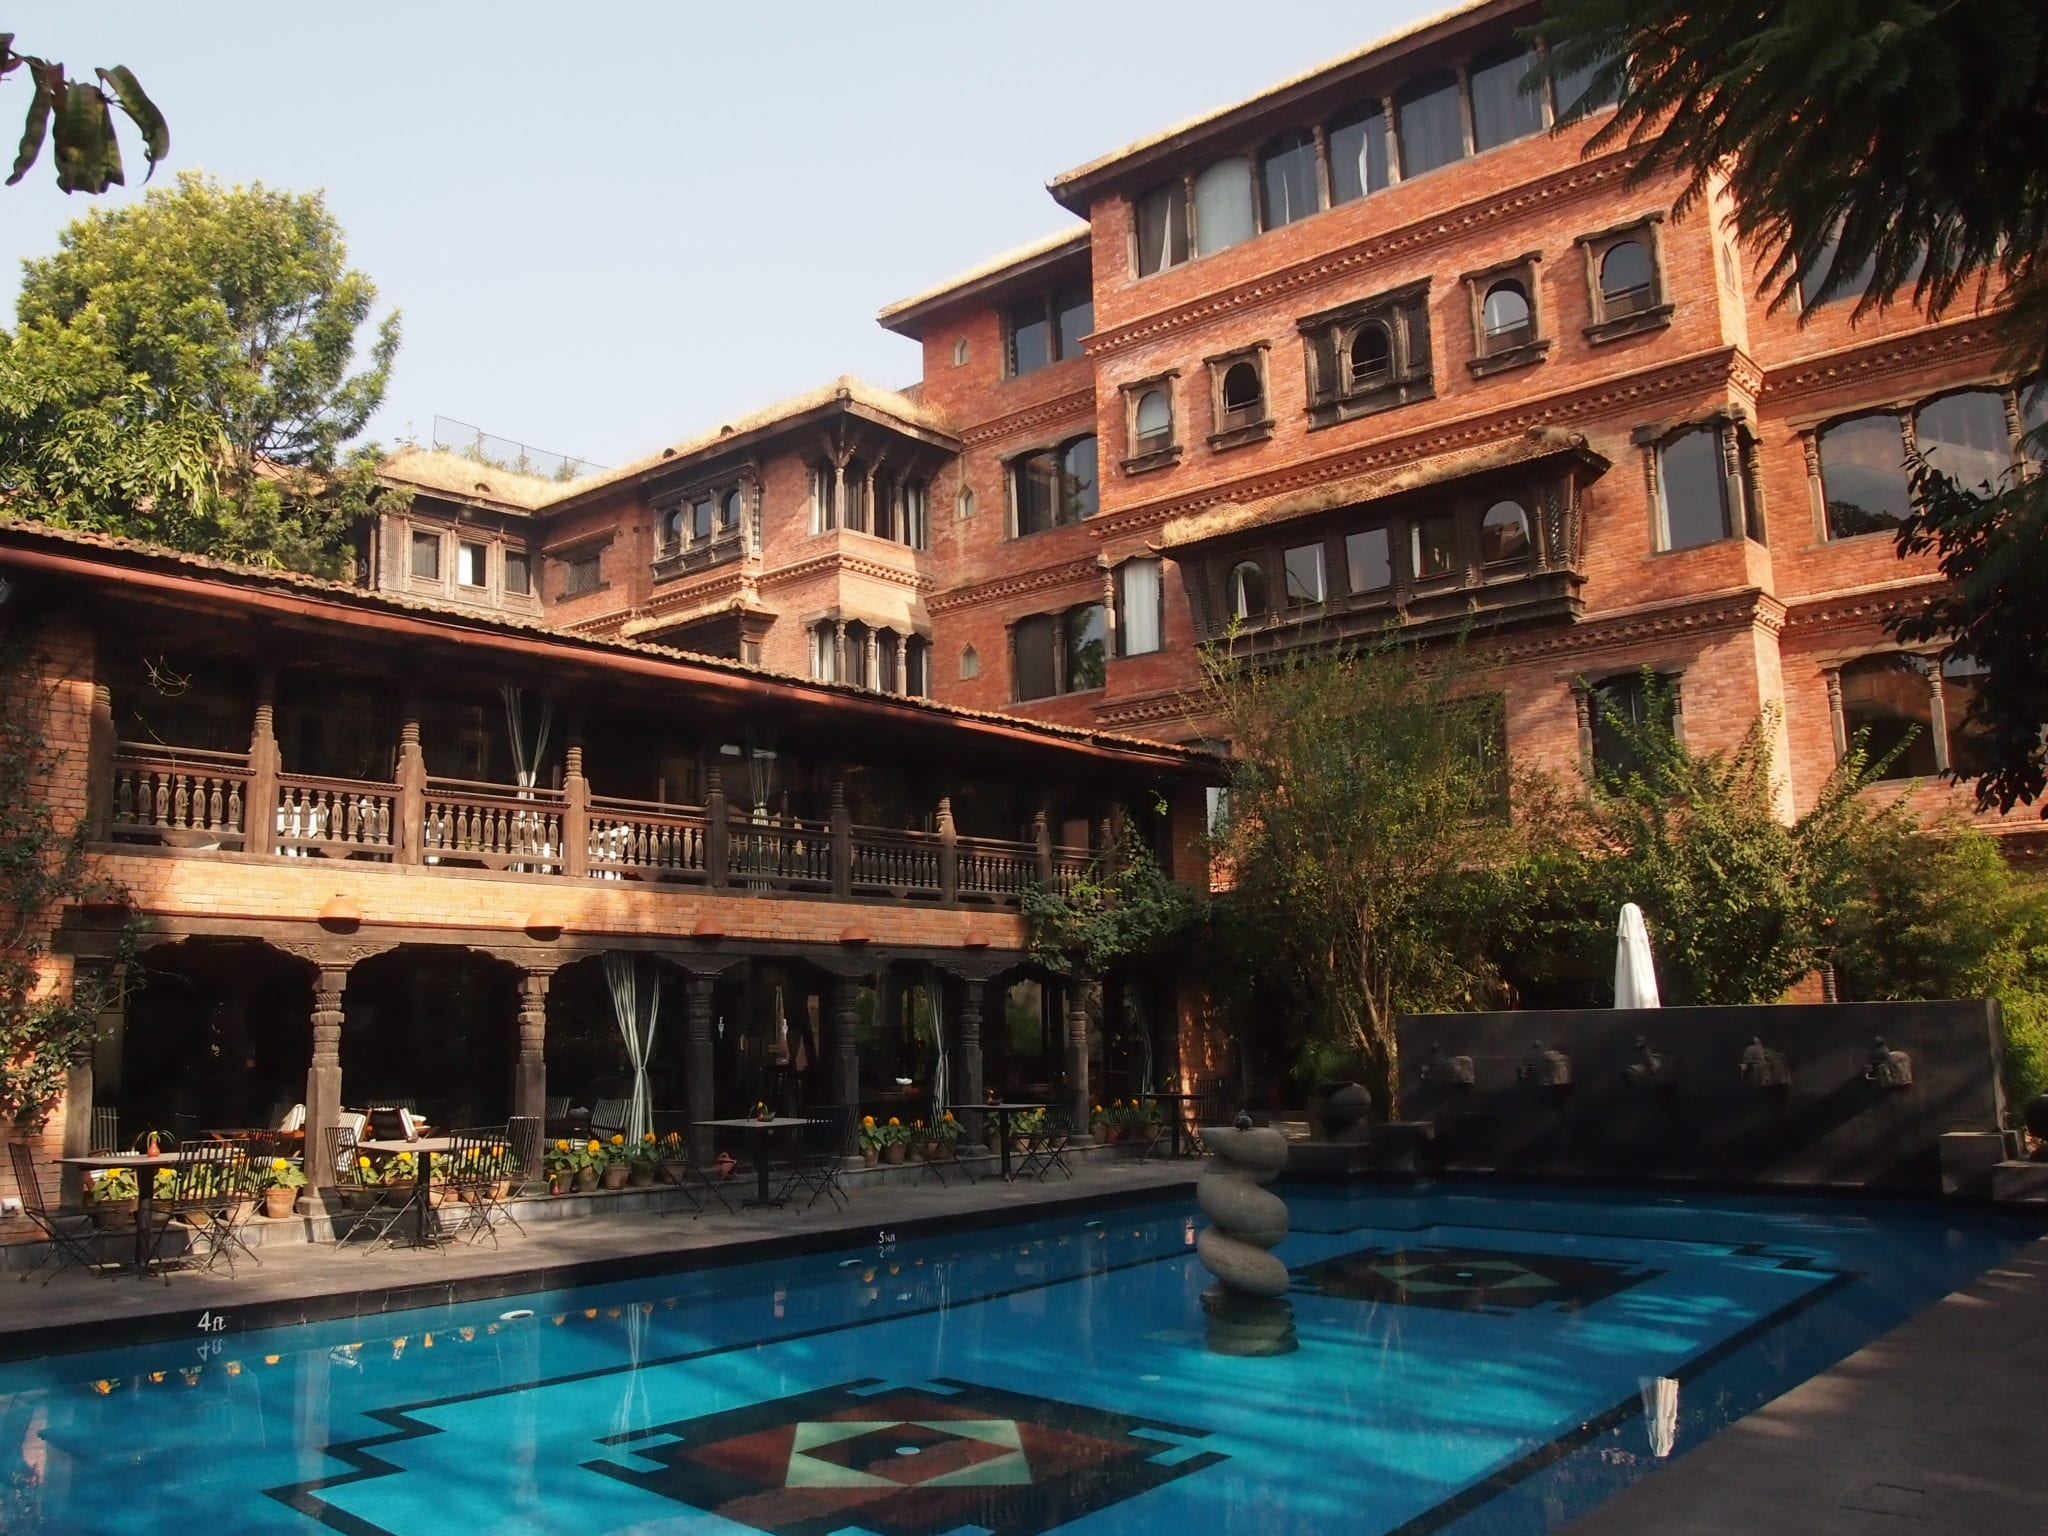 Dwarikas Hotel | © Elen Turner